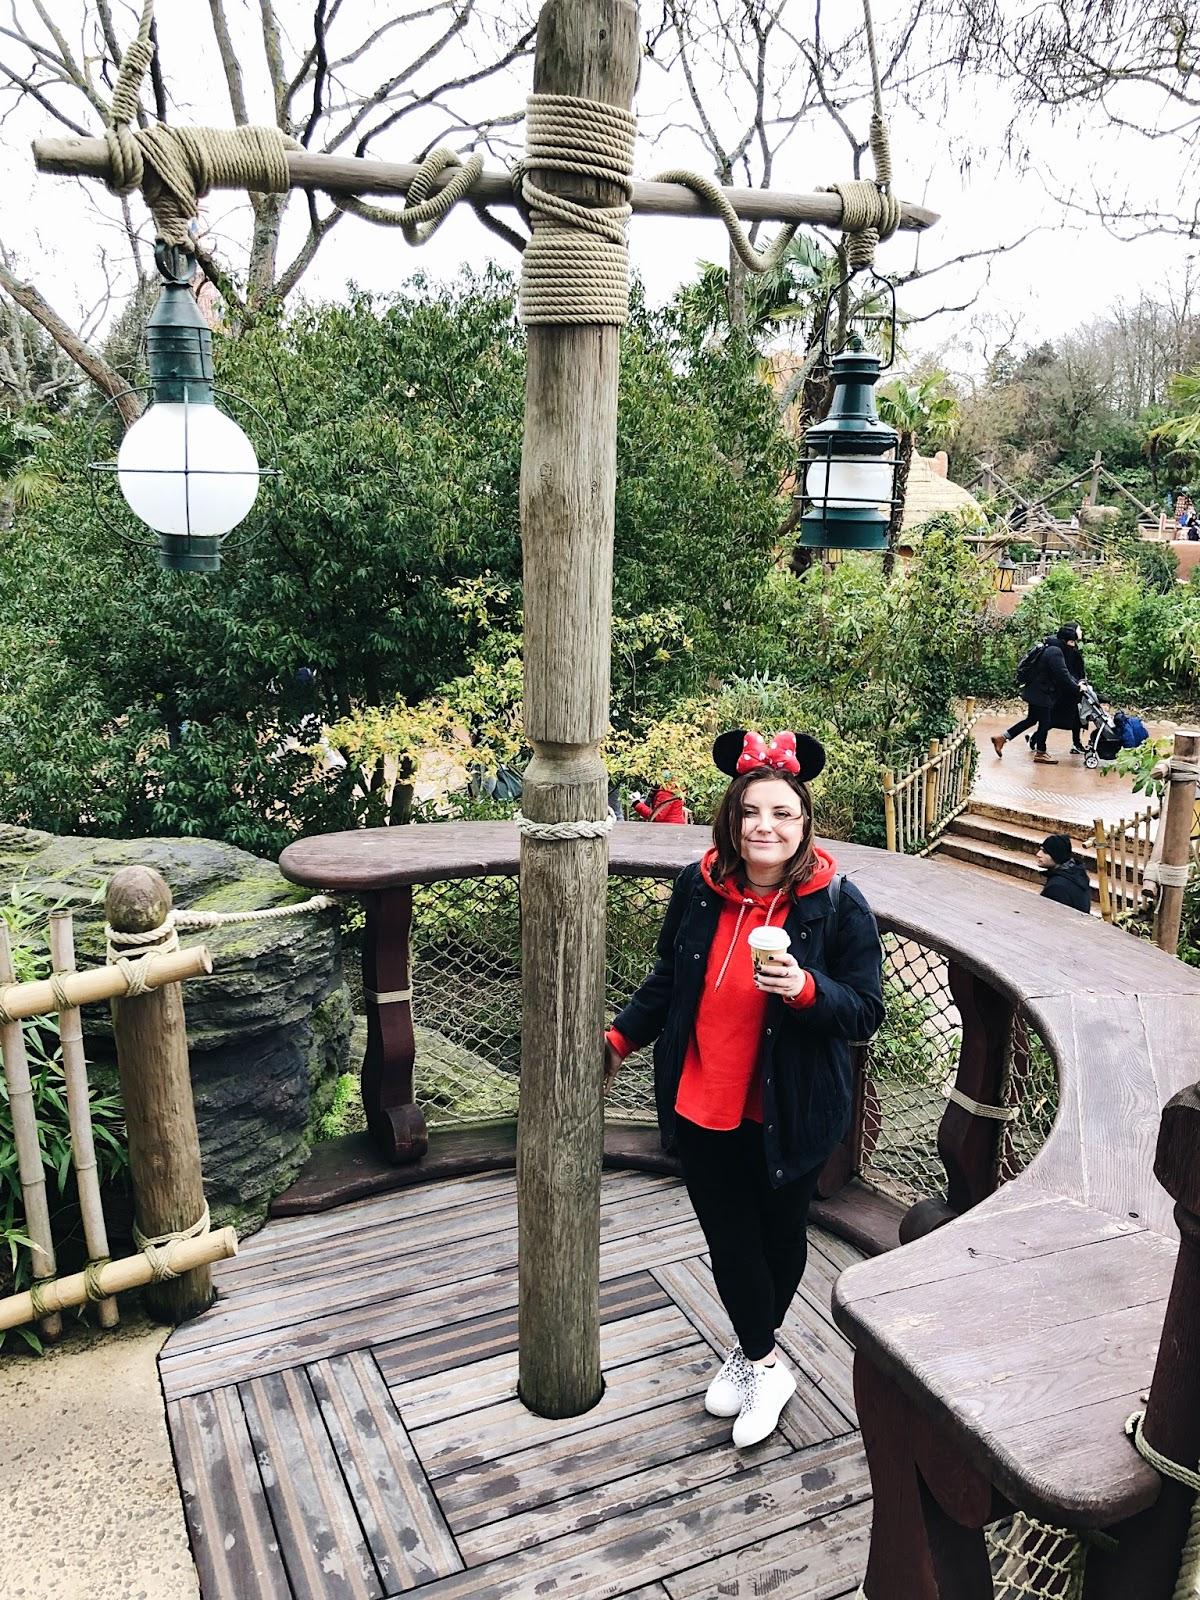 a Disneyland Paris wishlist - see the stars